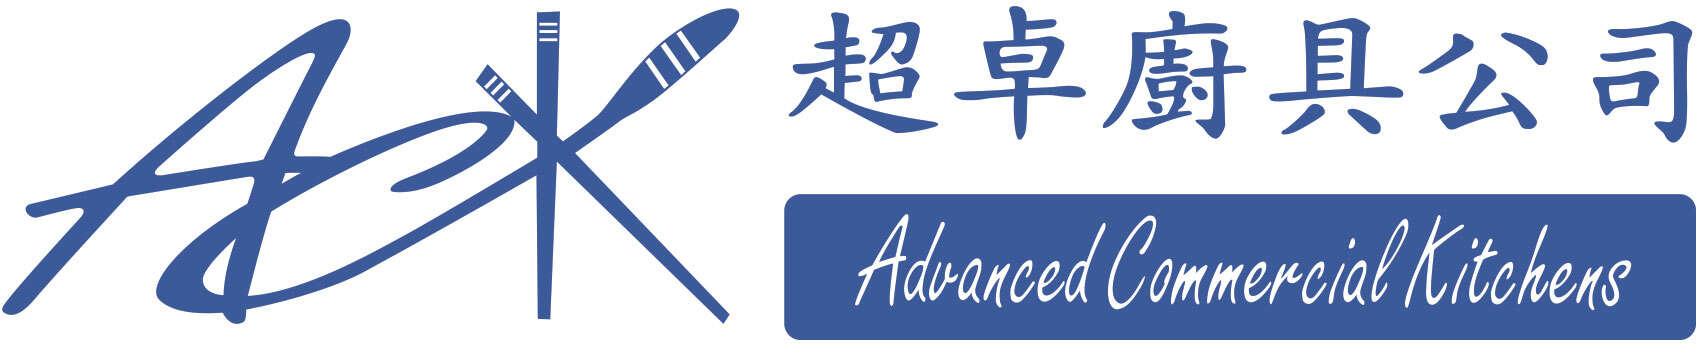 ack - ecommerce website development